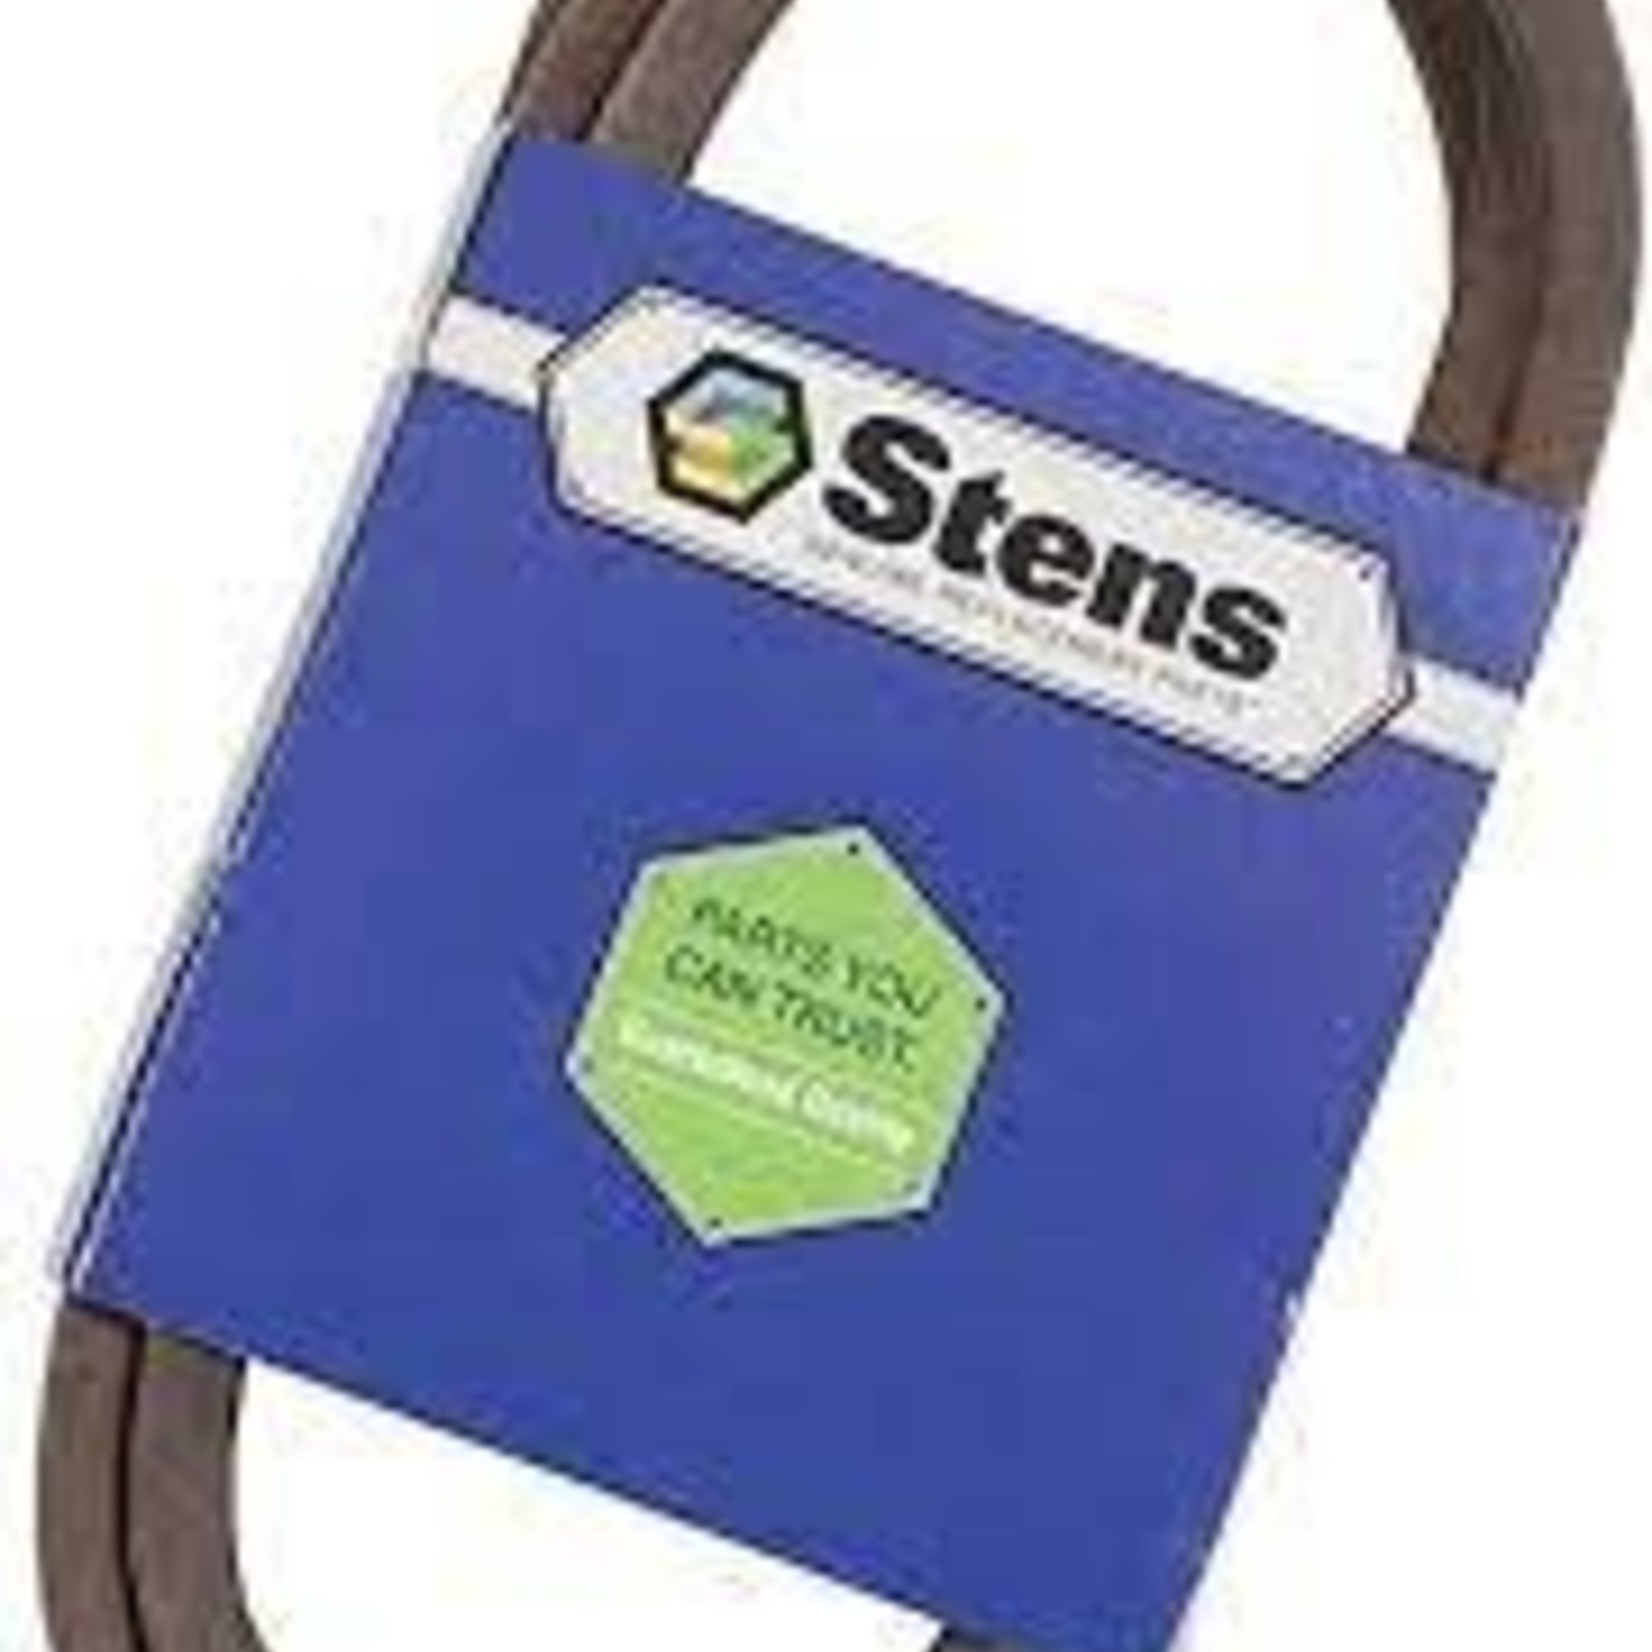 Stens 265-038 Belt Replaces John Deere M47766 80-1/8-Inch by-1/2-inch